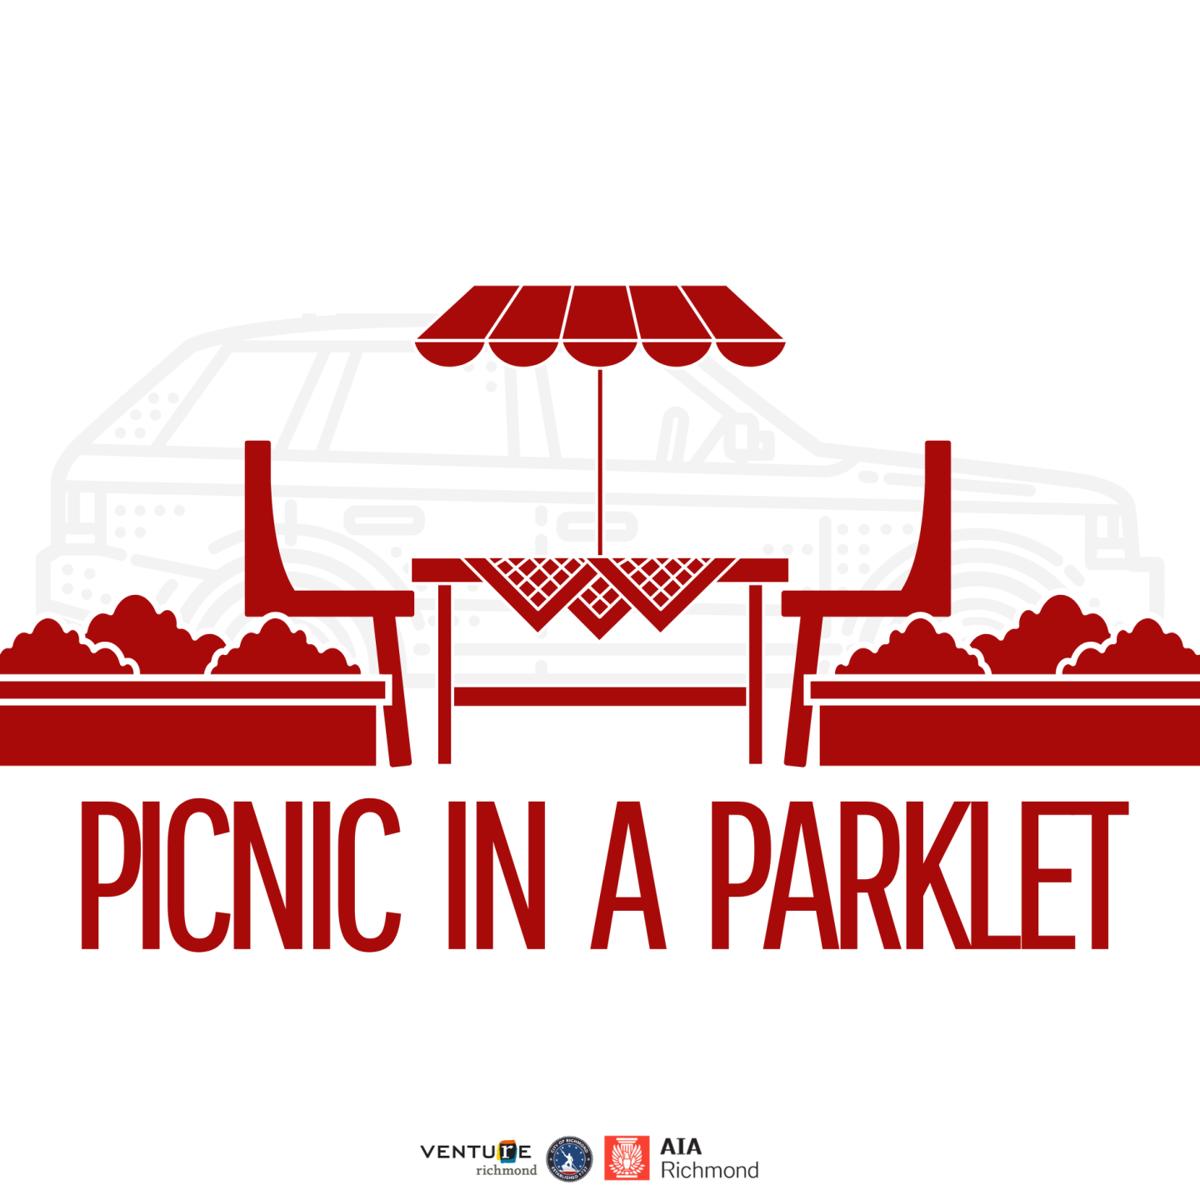 Picnic in a Parklet